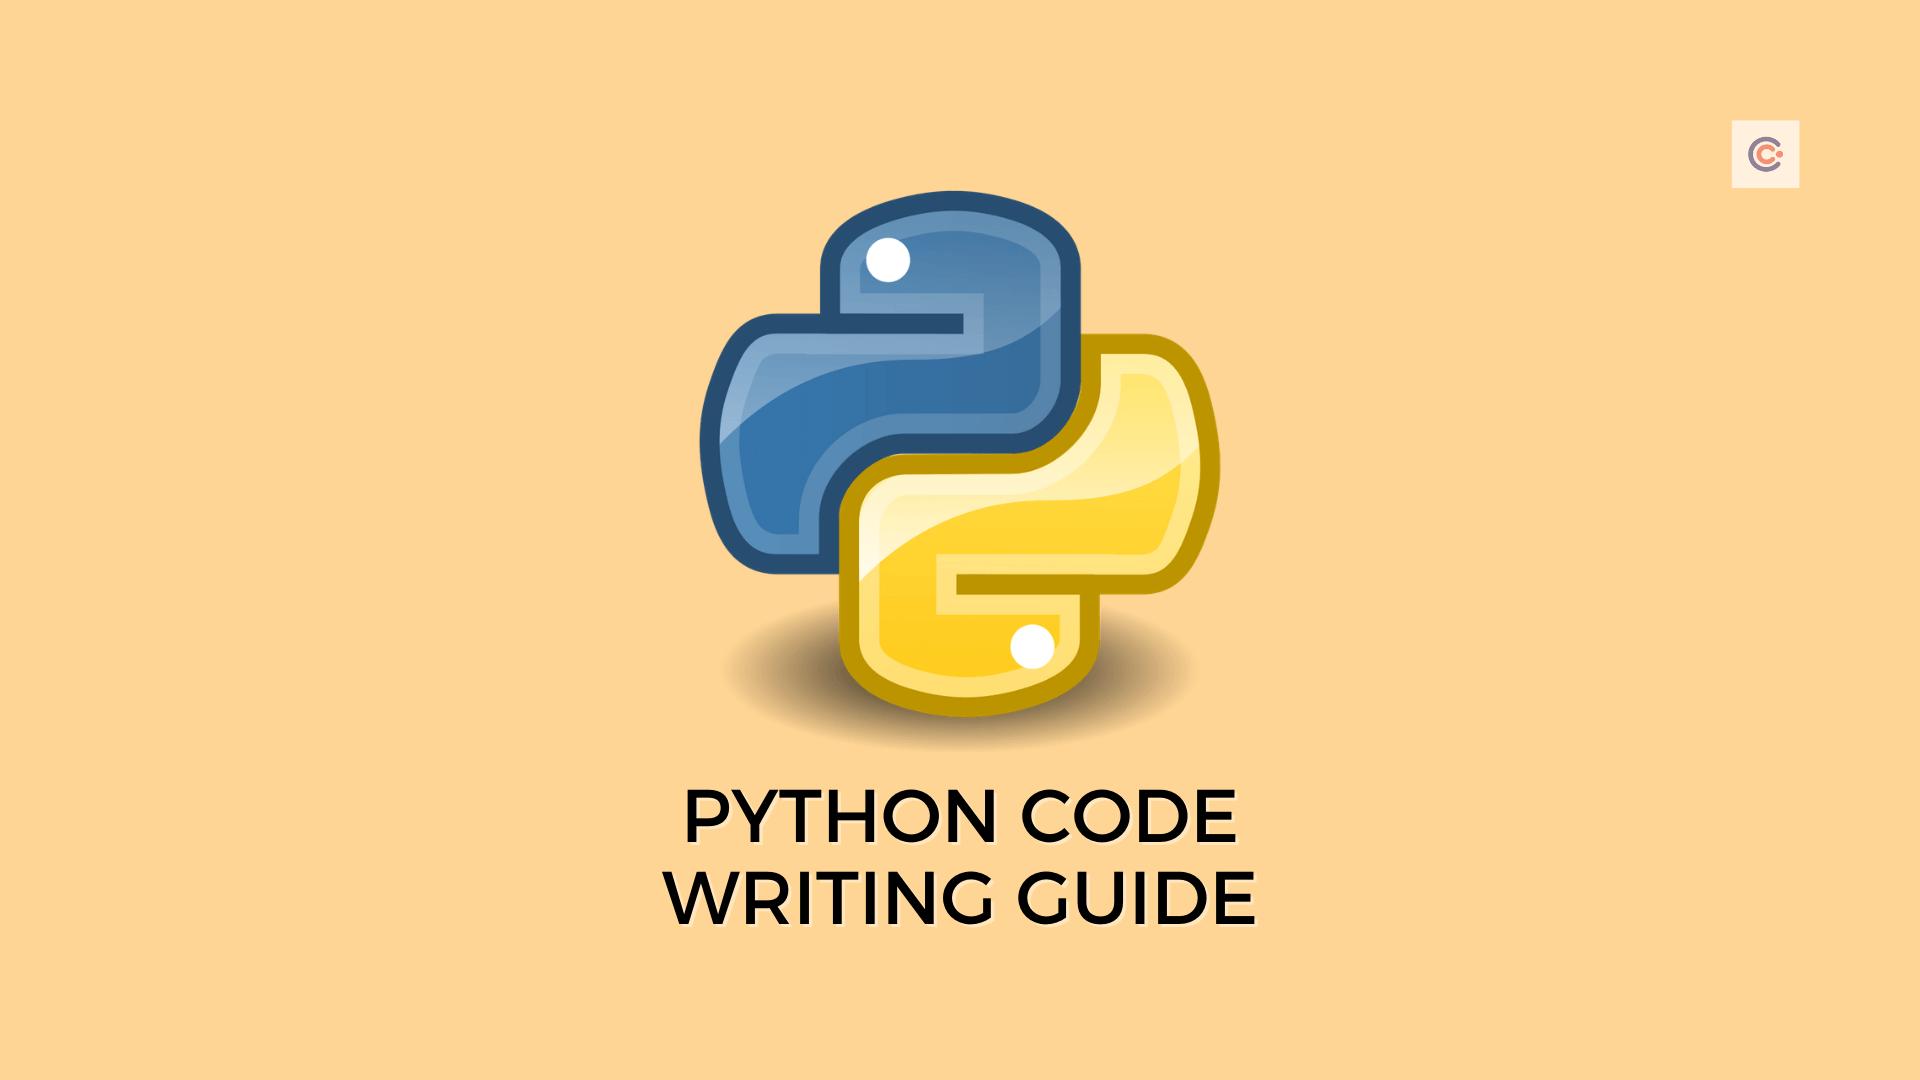 PEP8 - Python Code Writing Guide